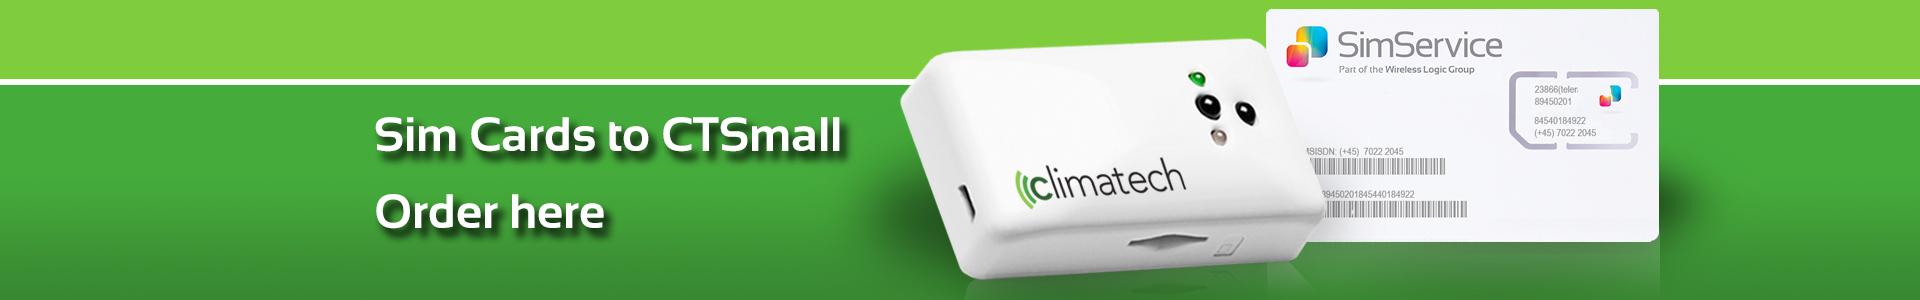 SIM-kort til CTSmall